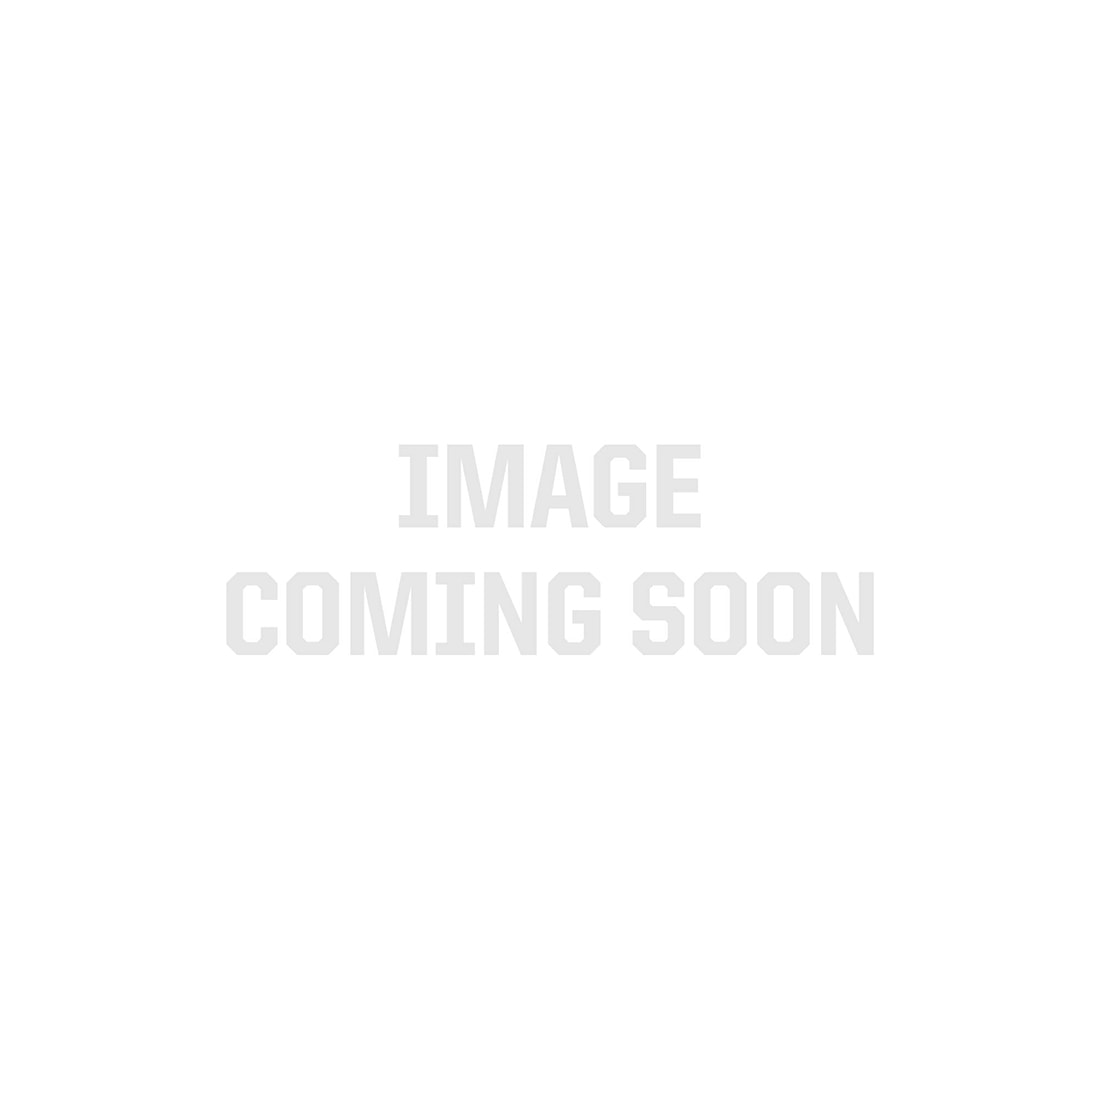 Amber 3528 Single Row LED Strip Light, 240/m, 10mm wide, Sample Kit